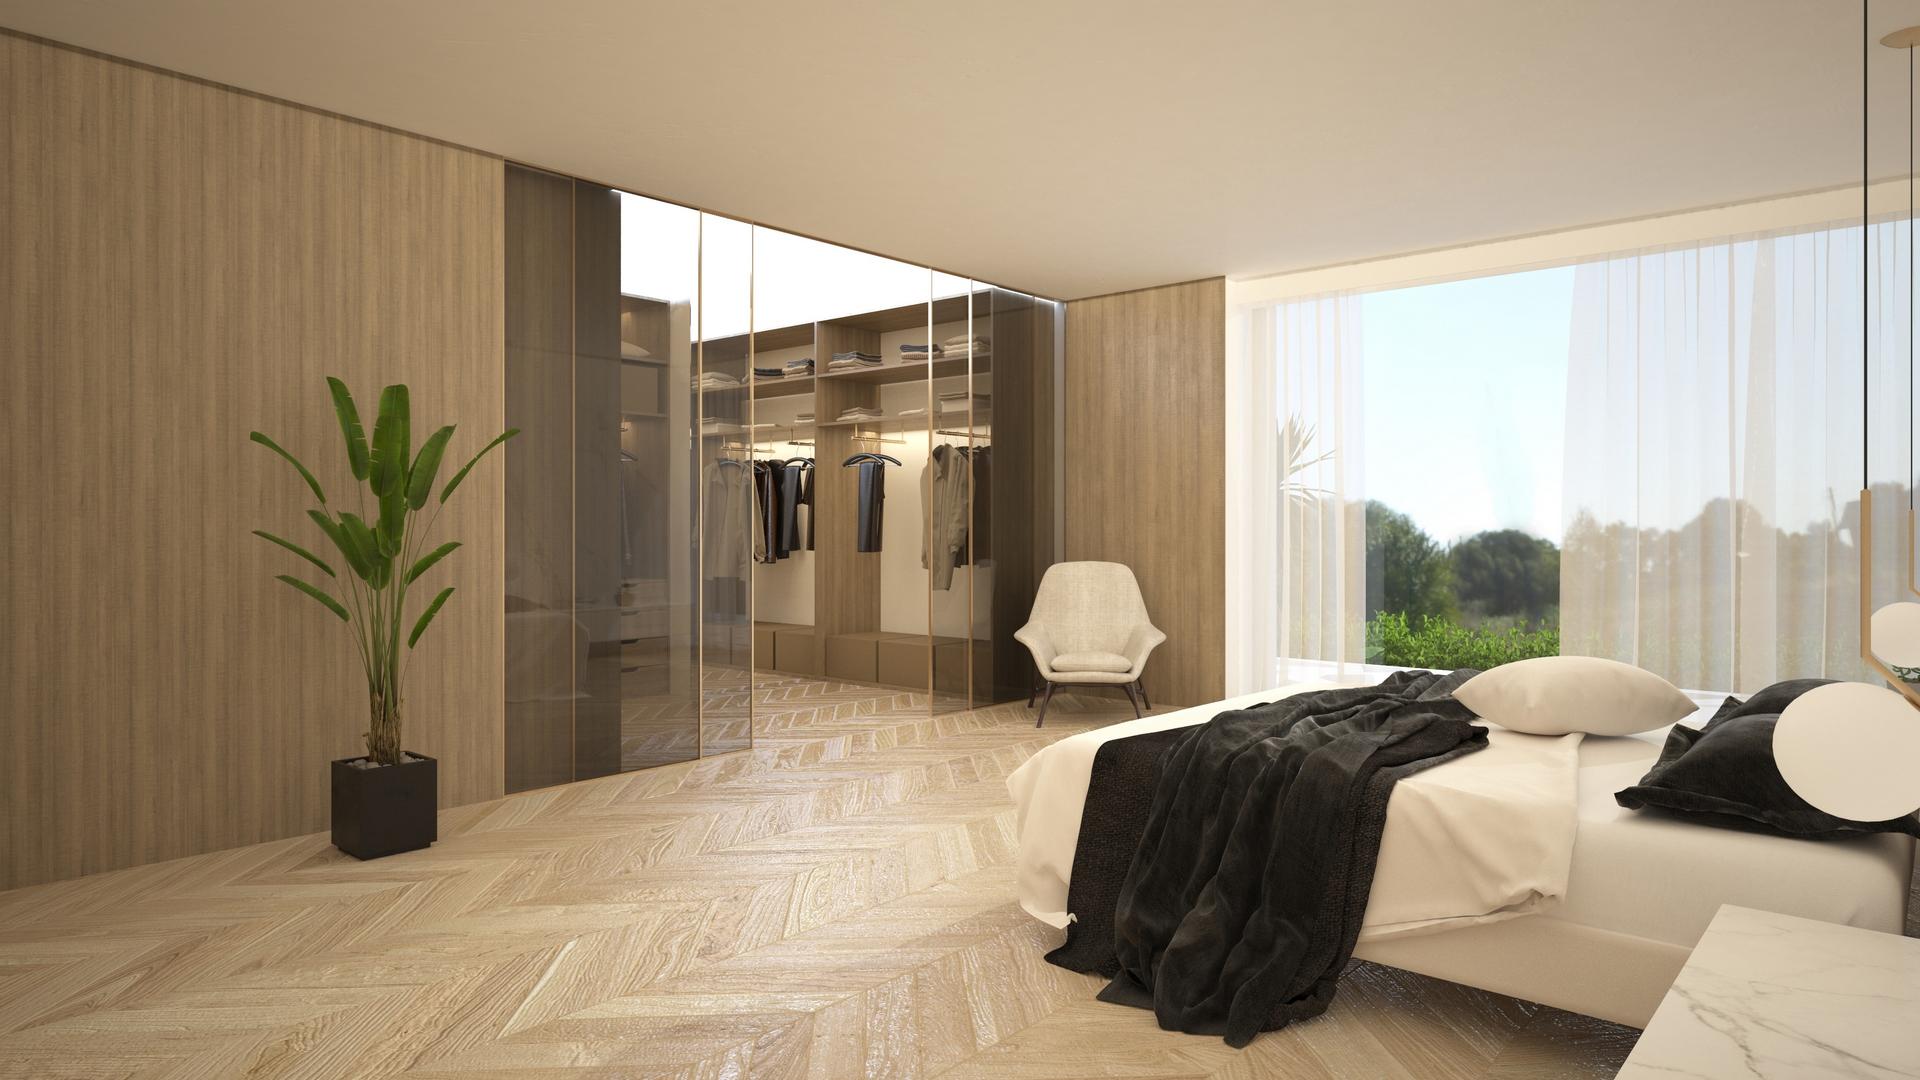 Ground floor - bedroom (Αντιγραφή)